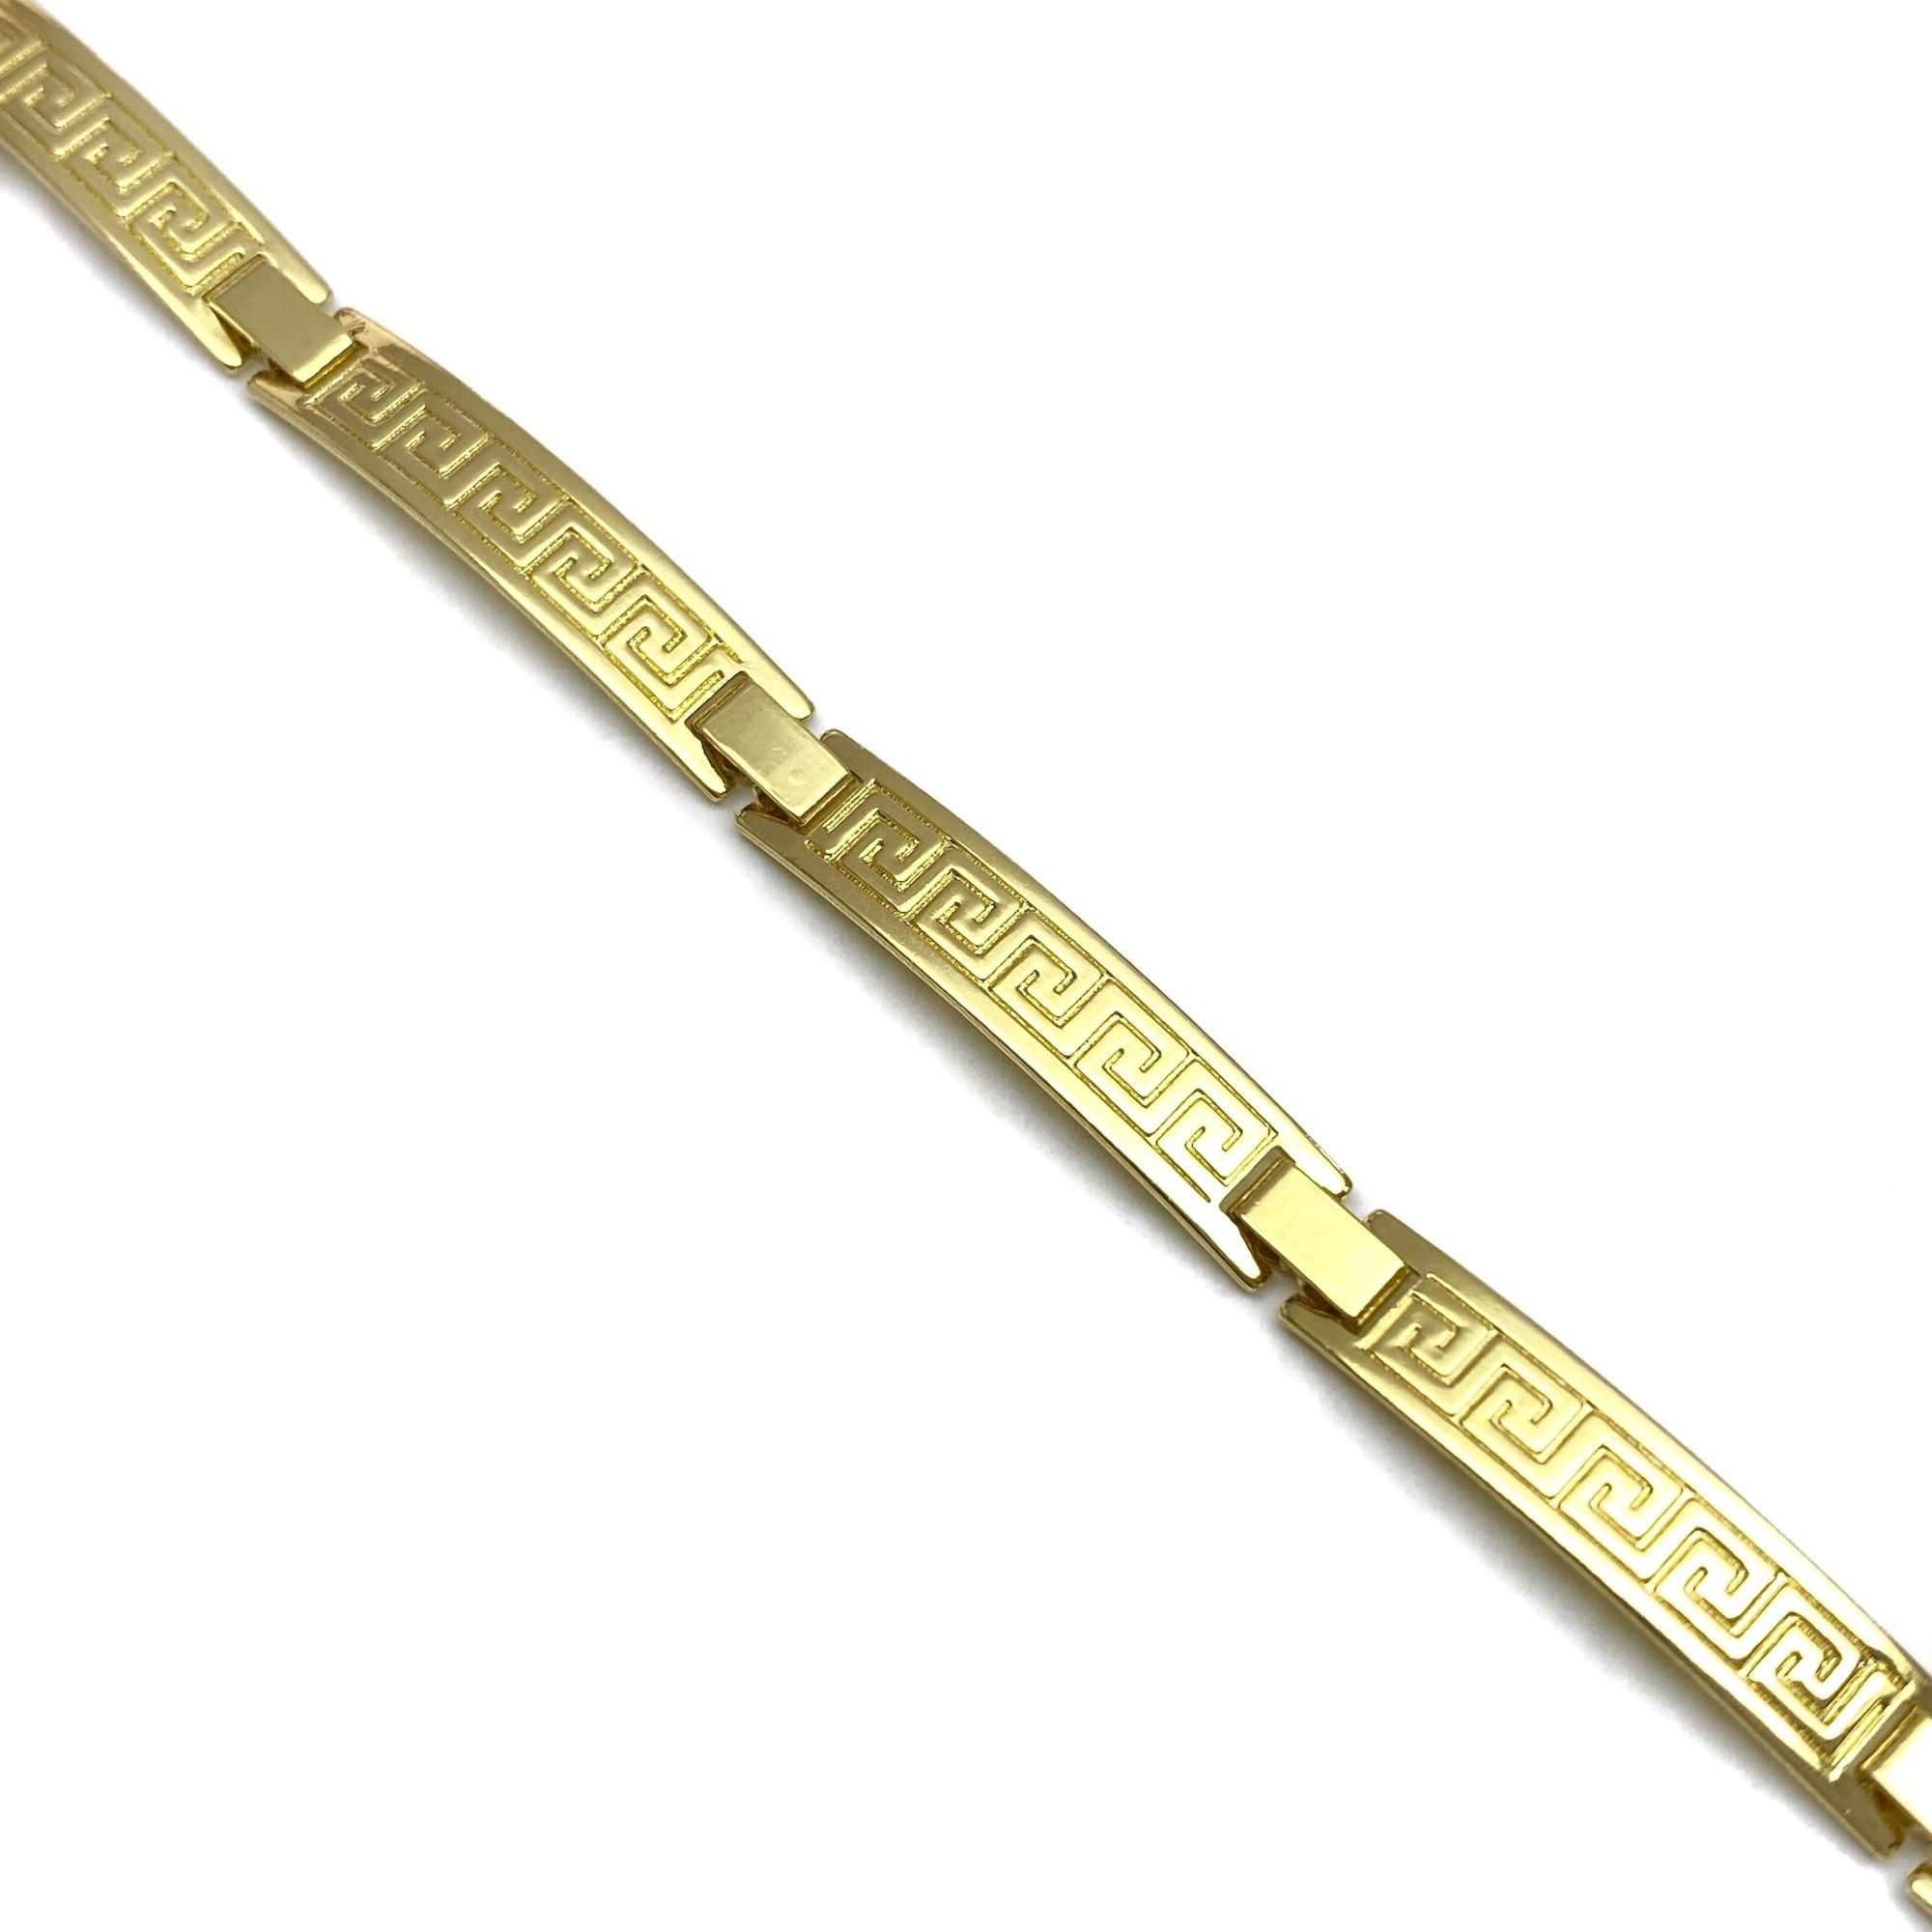 Bracelete Medusa 5mm 6g (Banho Ouro 24k)